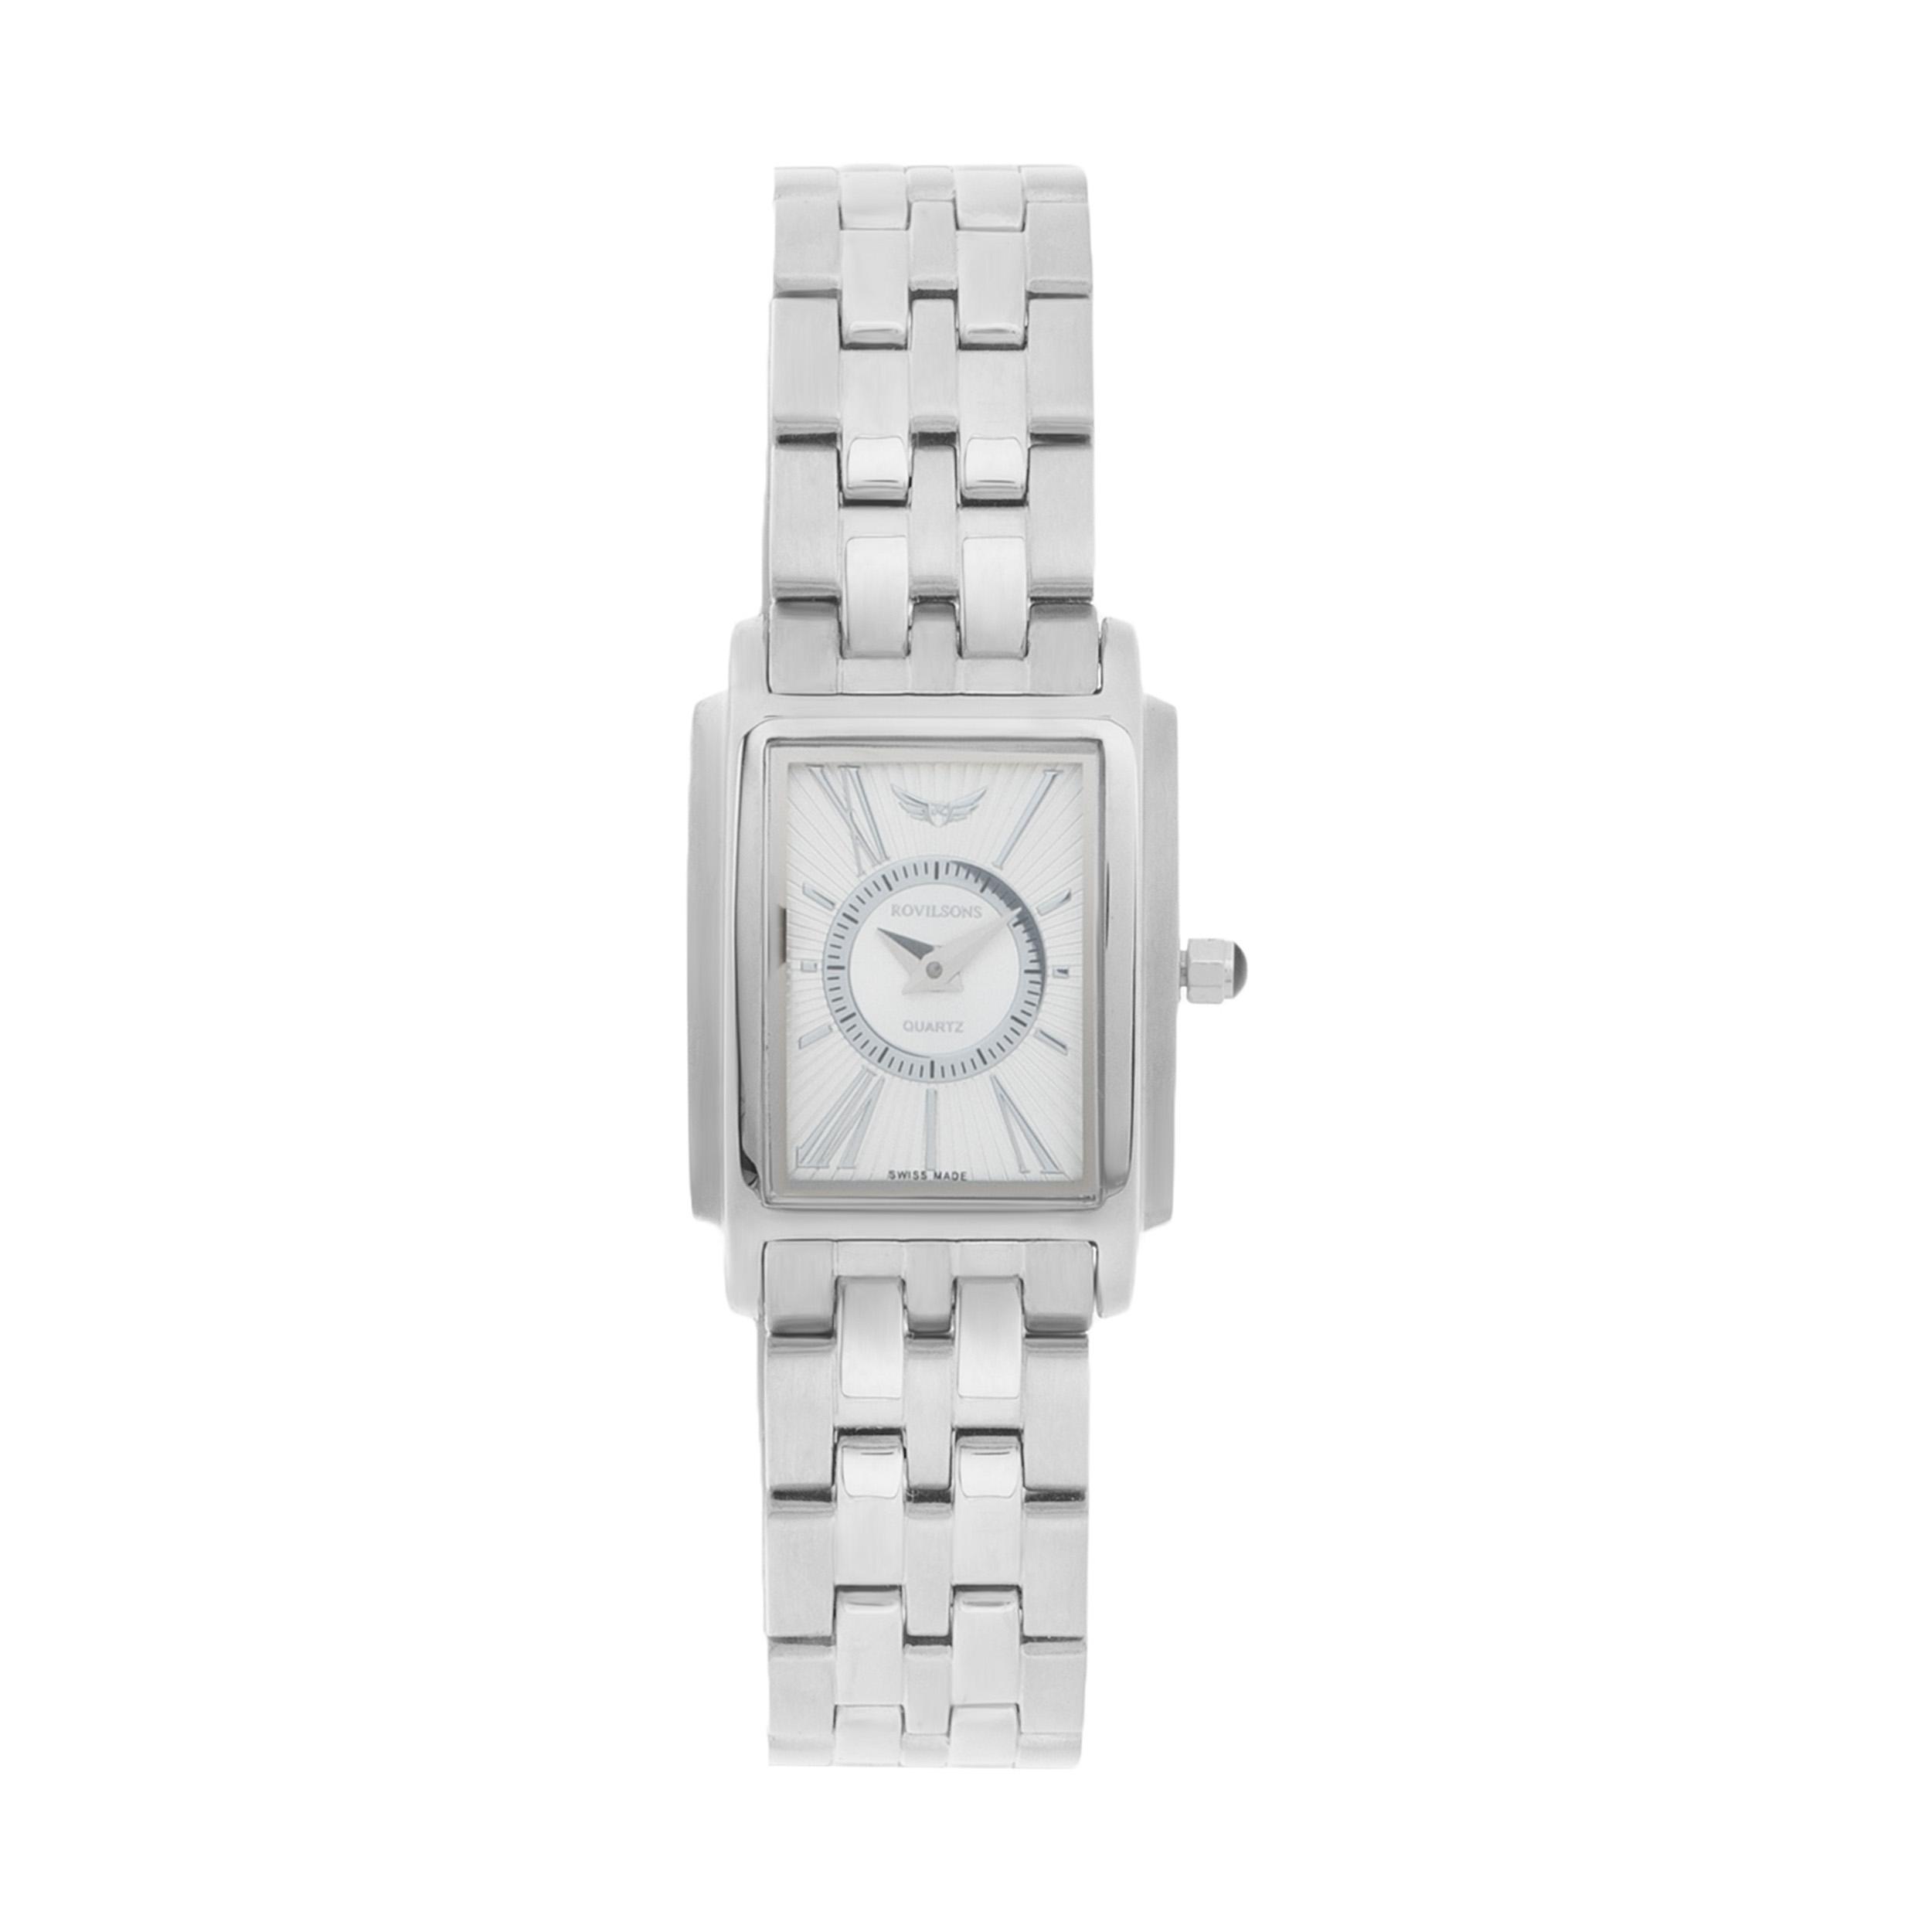 ساعت مچی عقربه ای زنانه راویلسون کد RW-012L-6